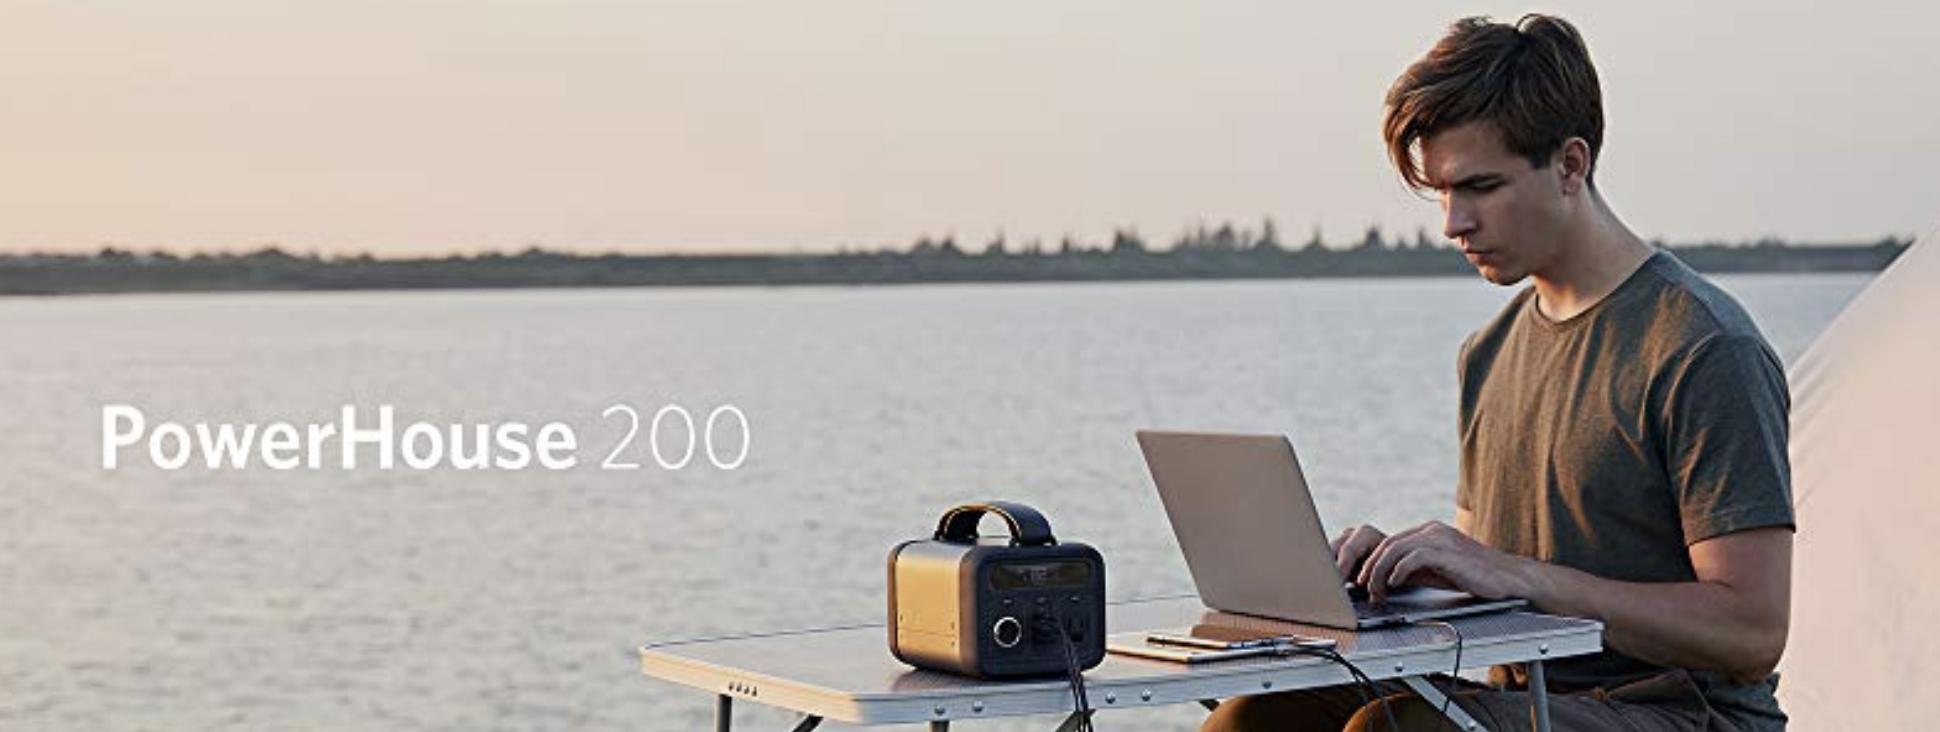 Anker Powerhouse 200 charging MacBook